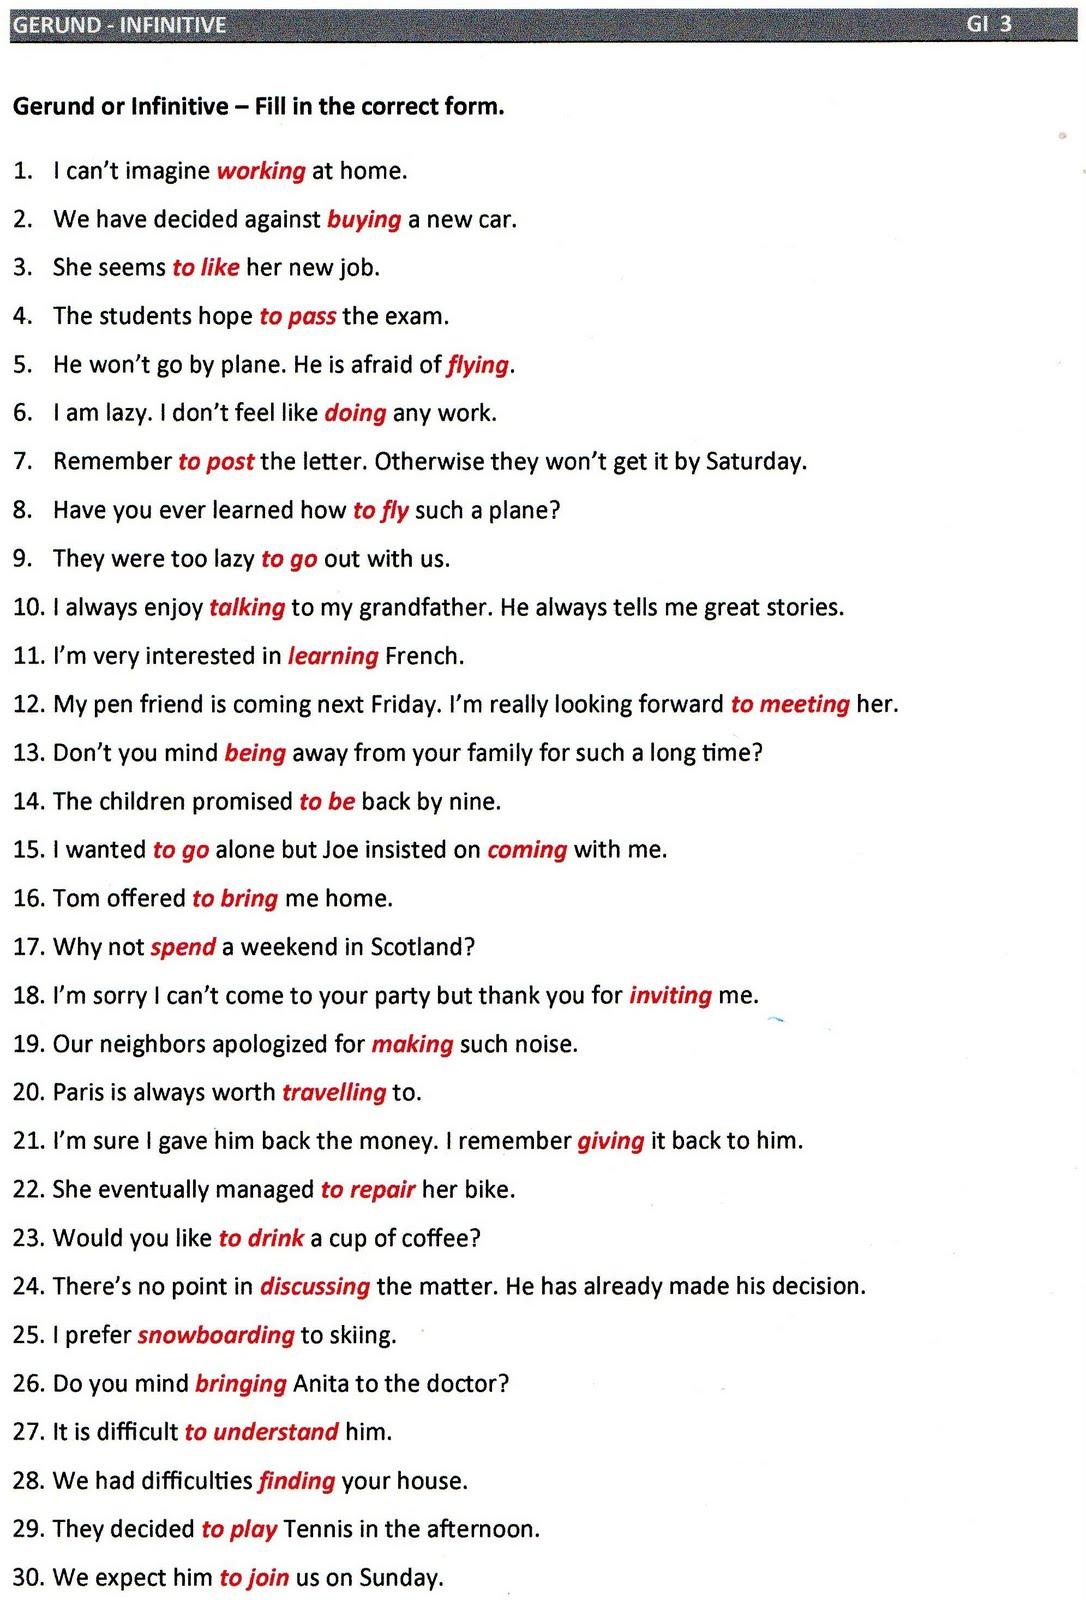 Gerund Worksheet With Answers